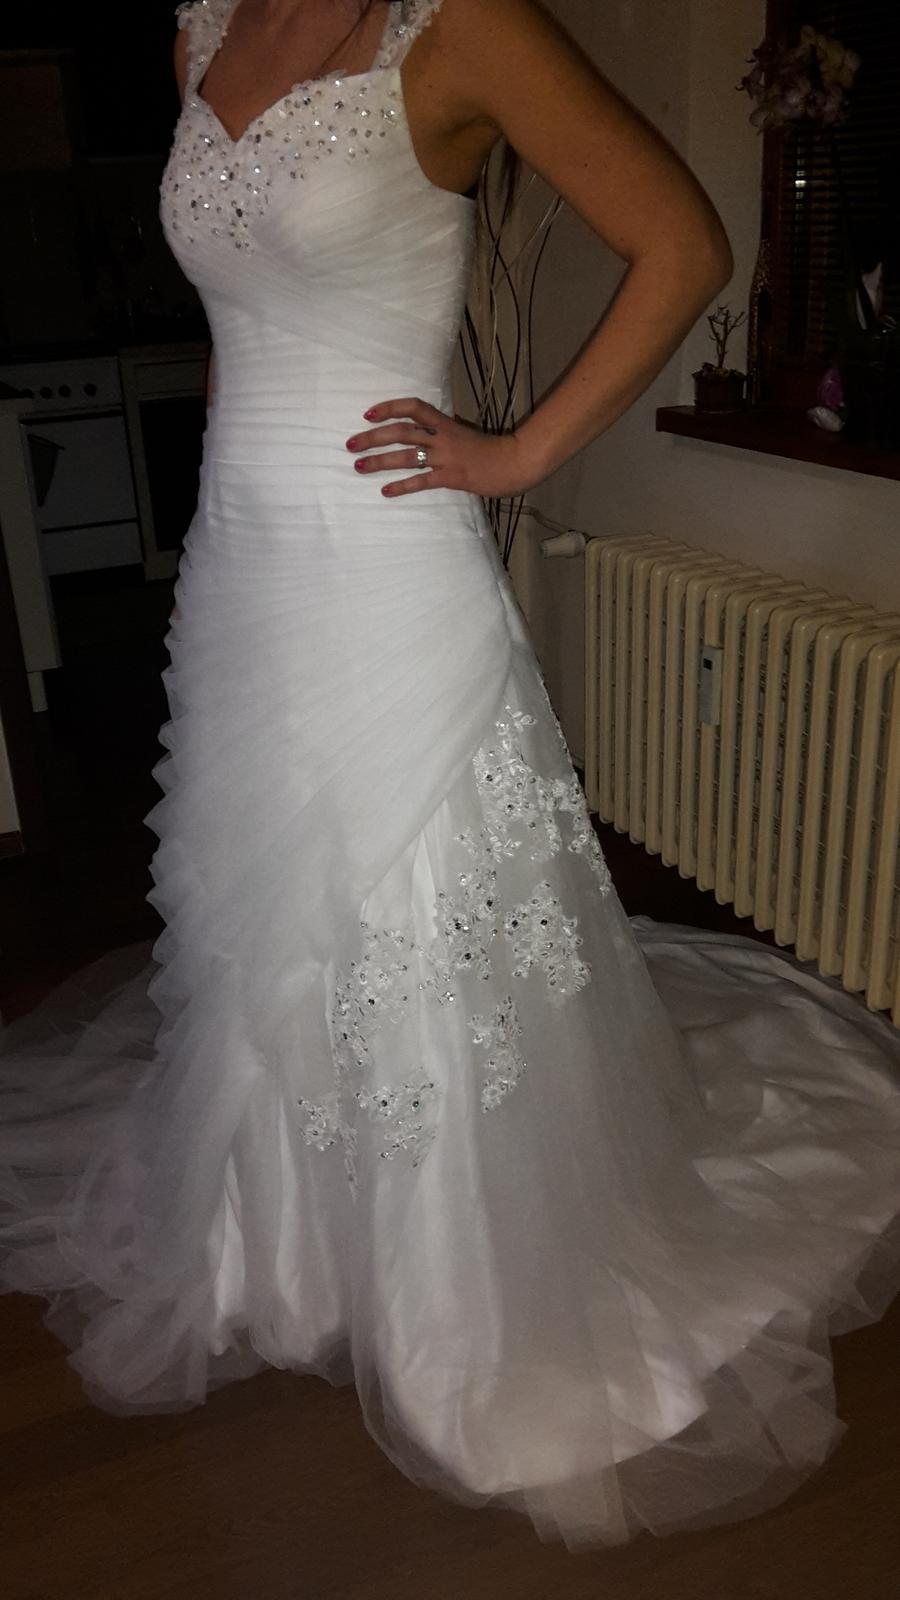 Svadobné šaty (nové) - Obrázok č. 1